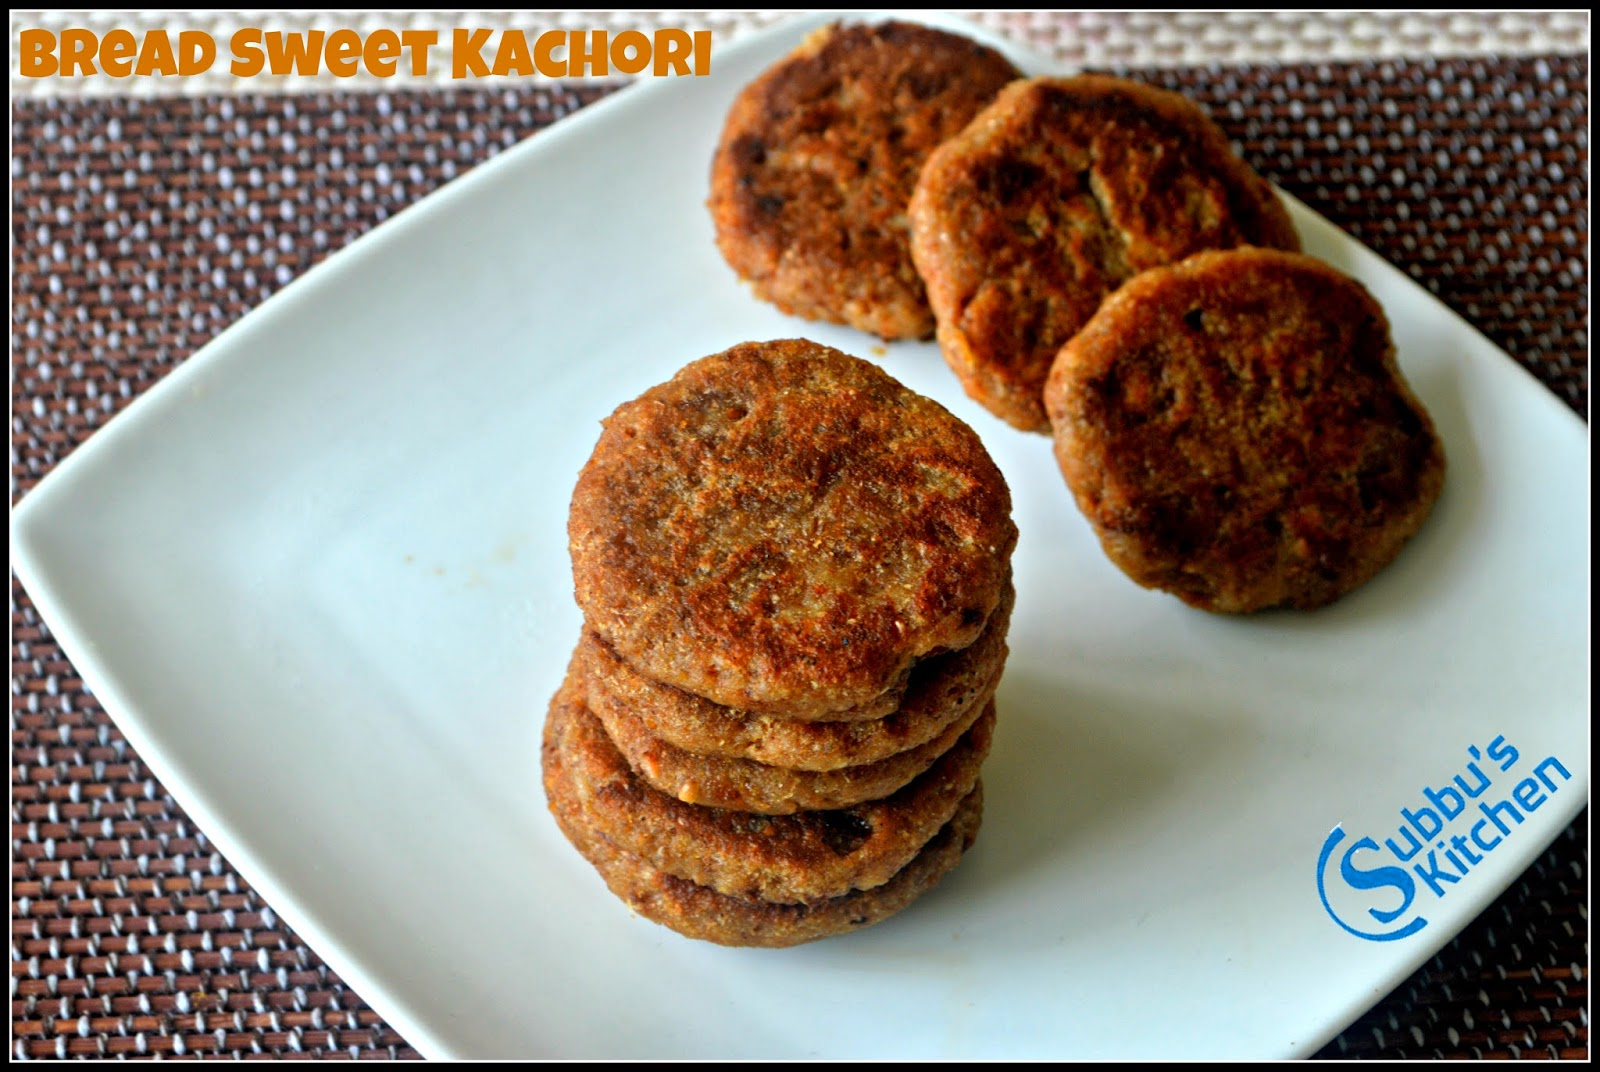 Bread Sweet Kachori